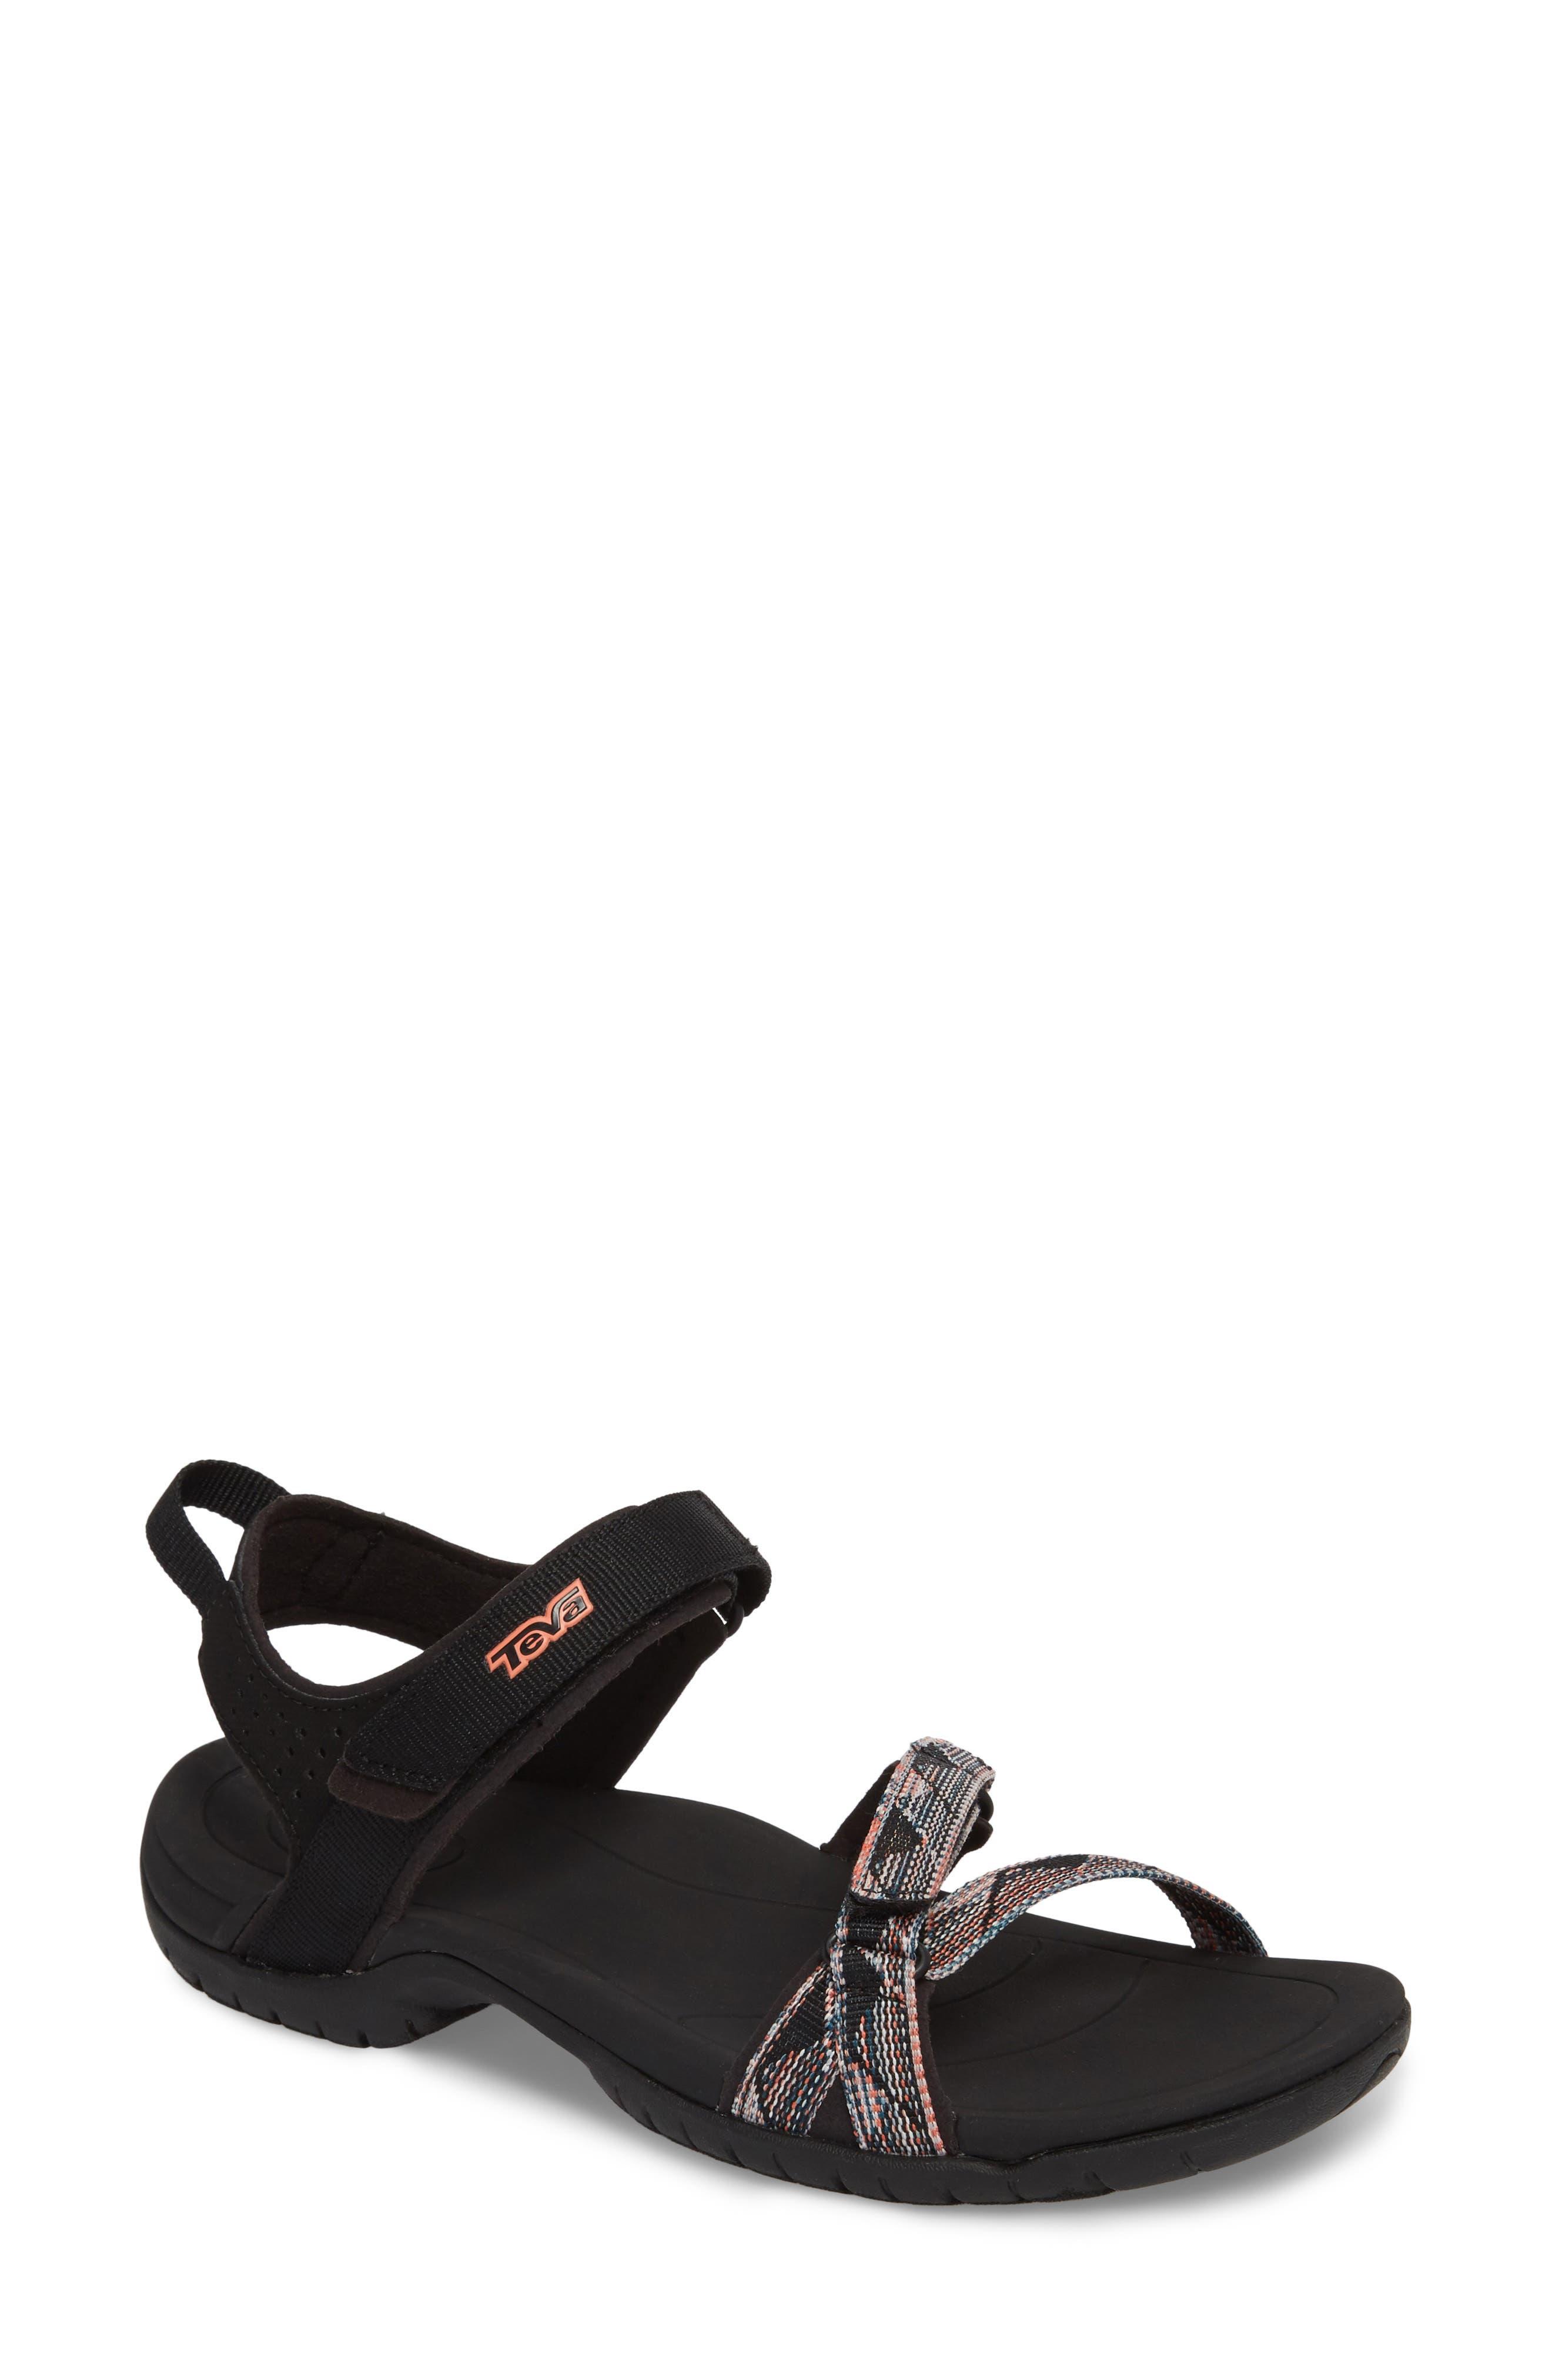 'Verra' Sandal,                         Main,                         color, Suri Black Multi